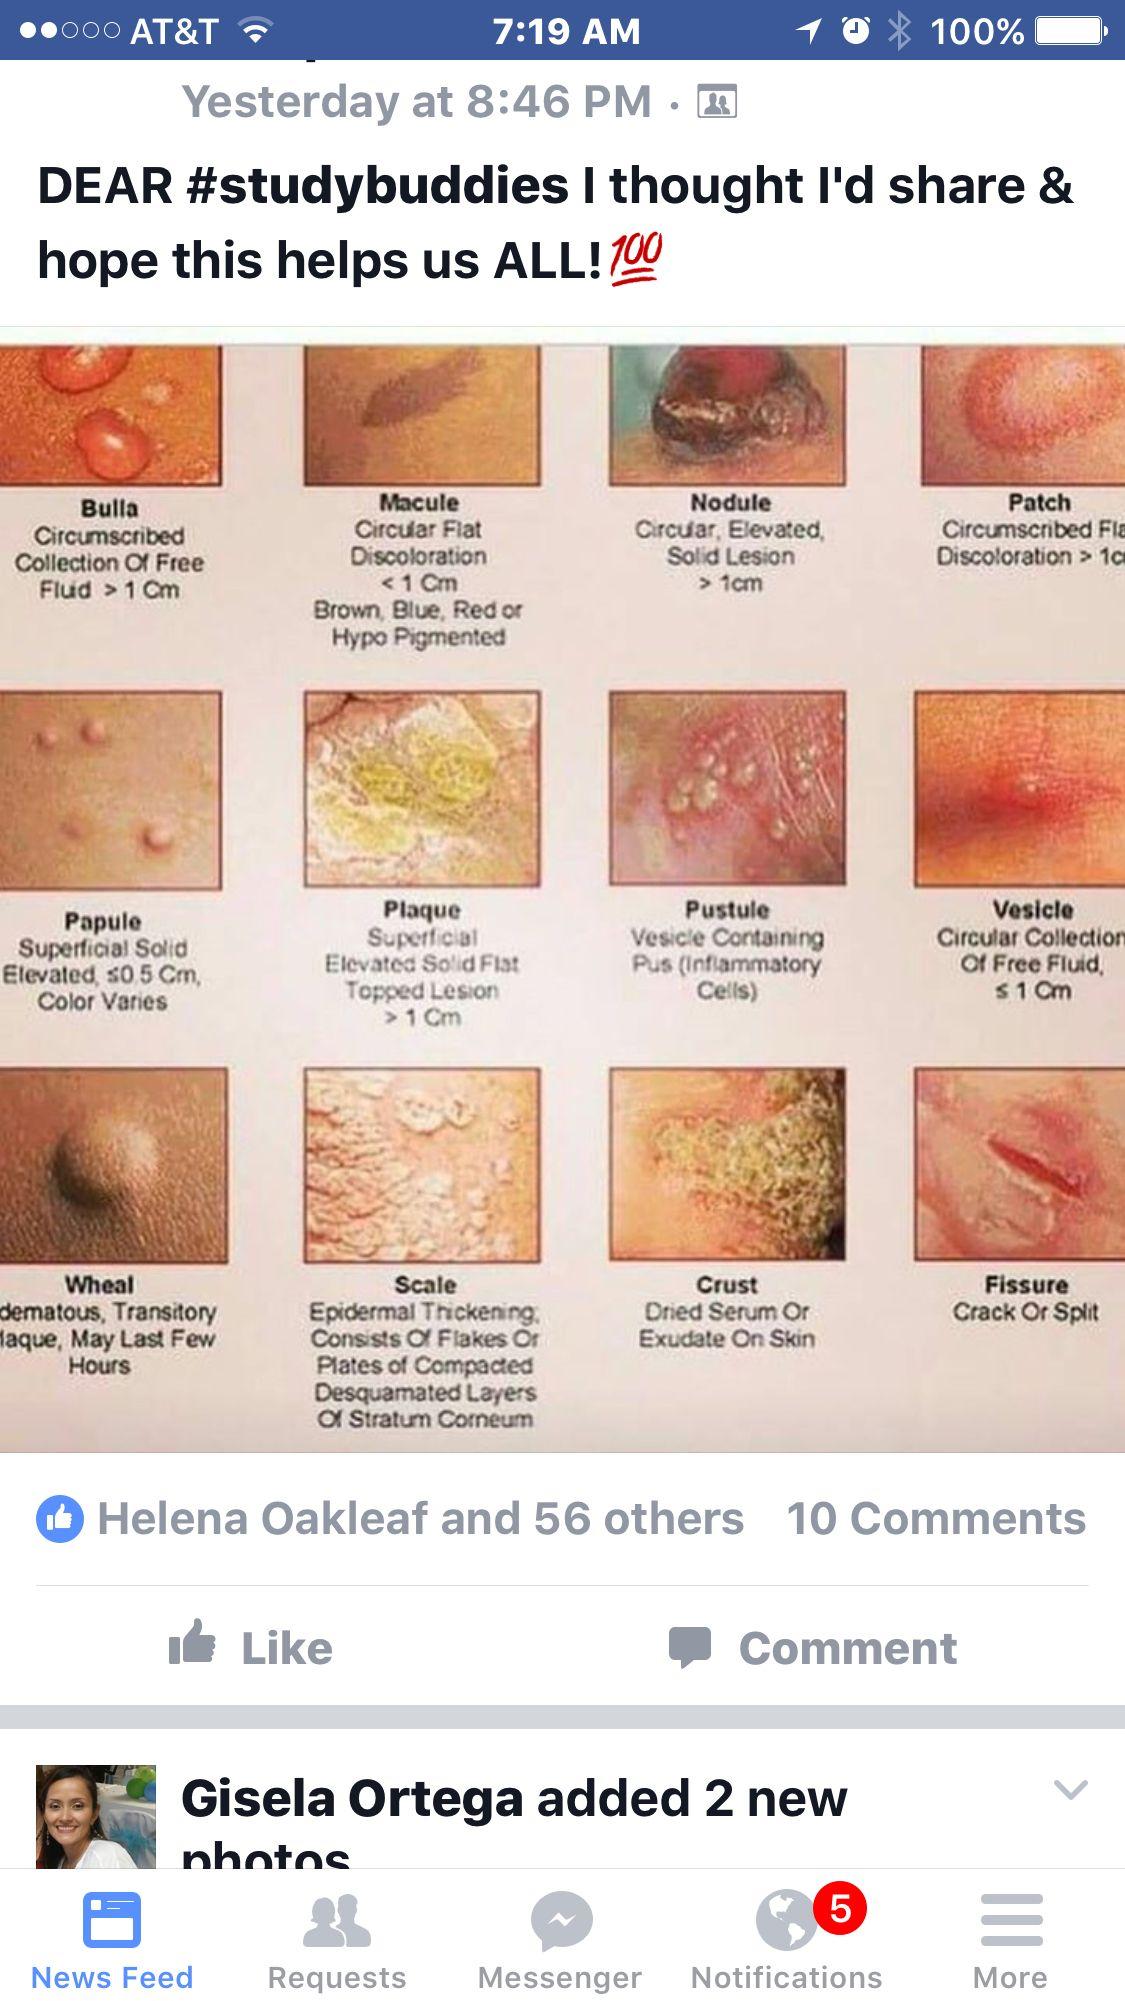 Dermatology Identification